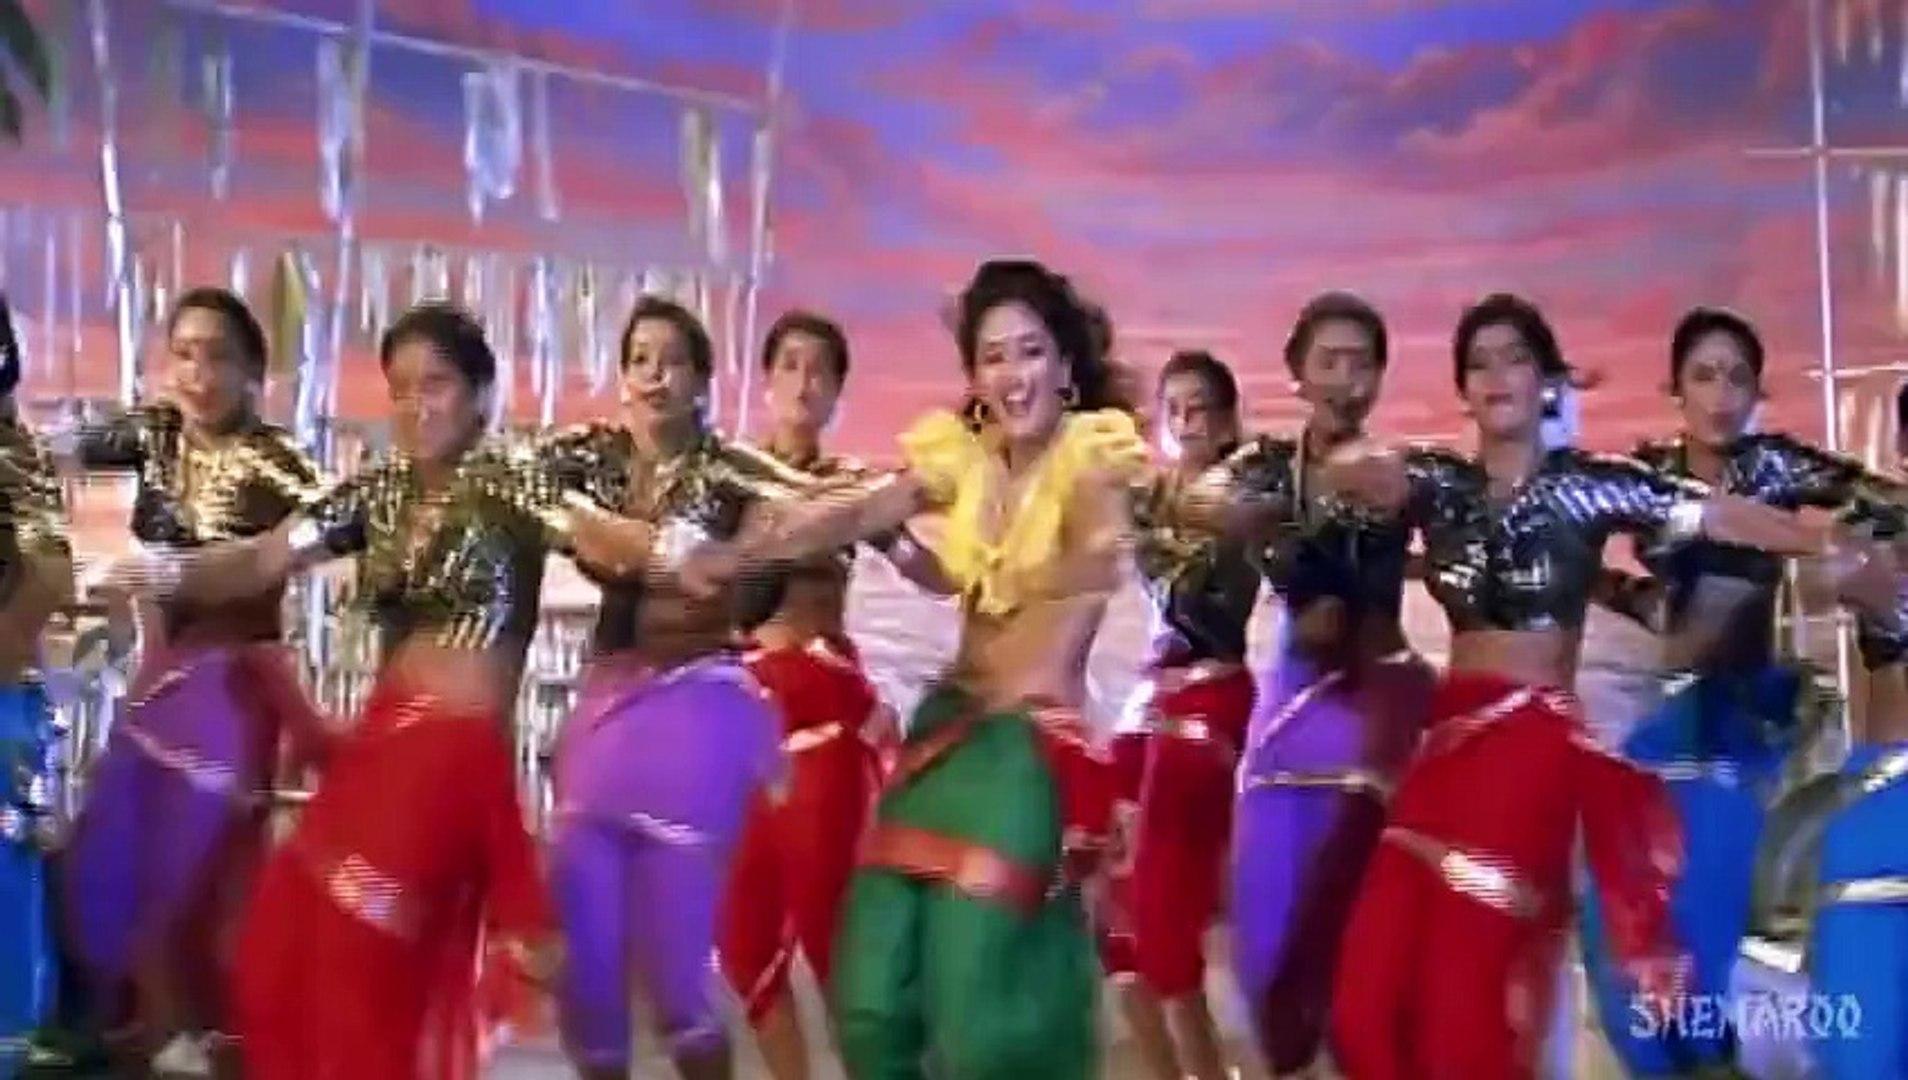 Humko Aaj Kal Hai Intezaar - Madhuri Dixit - Sailaab Songs - Aditya  Pancholi - Anupama- Full Video Song